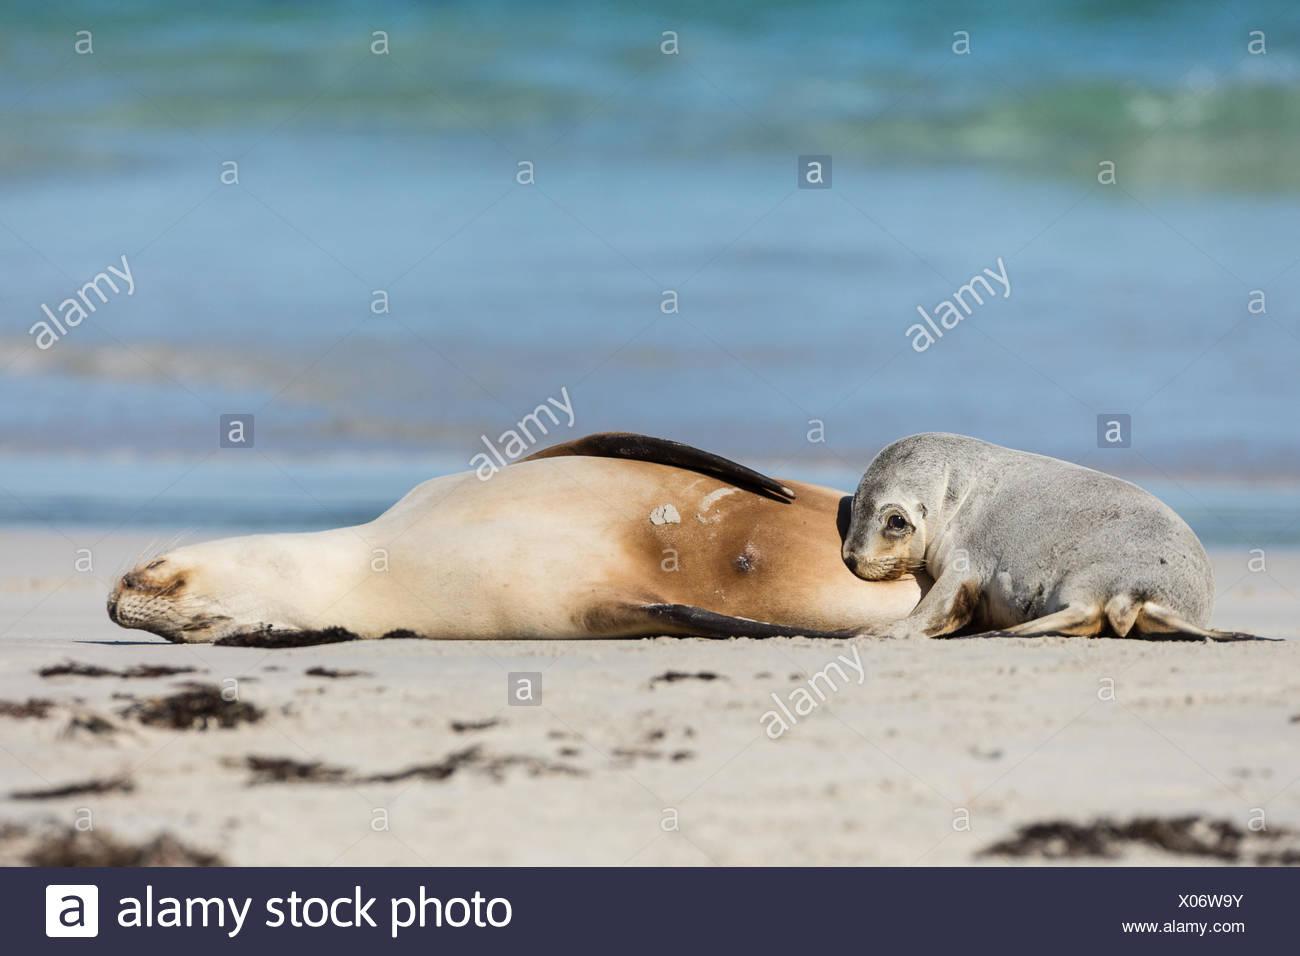 Australian sea lion female and baby, Neophoca cinerea, on the beach. - Stock Image